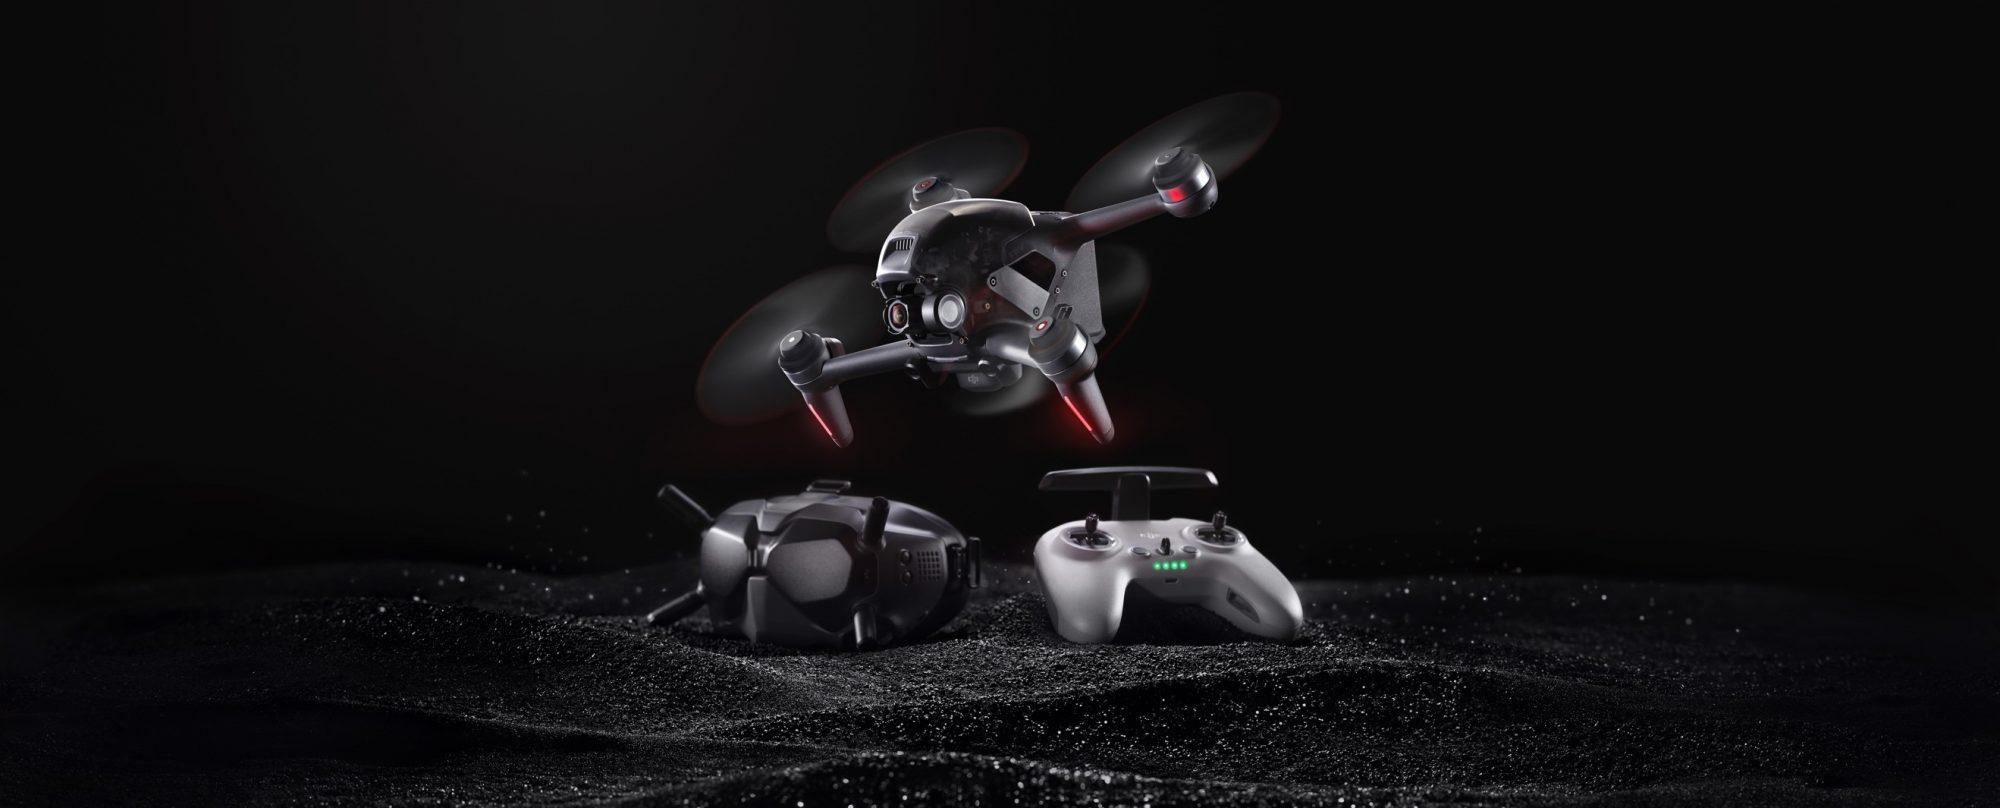 Dron DJI FPV, gafas y control remoto